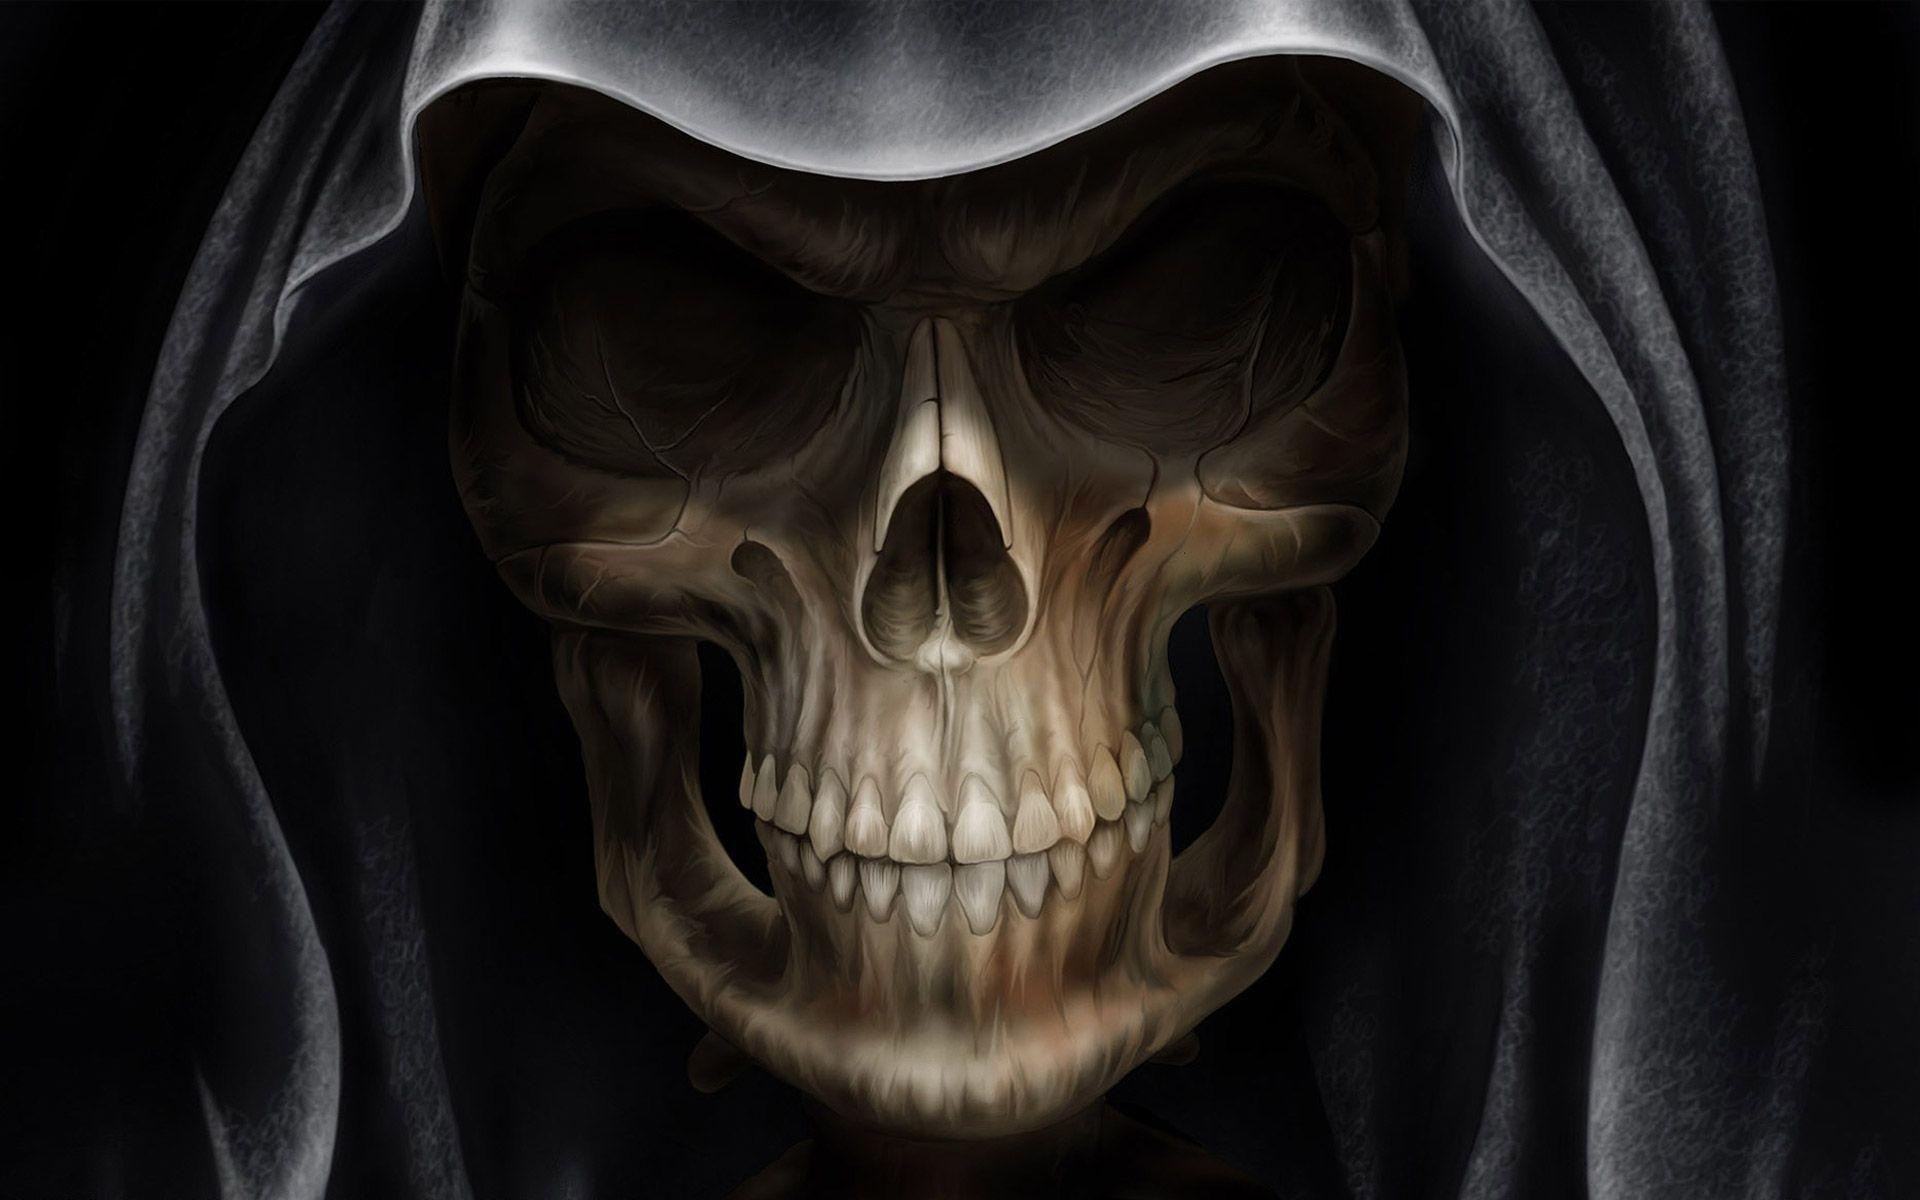 Res: 1920x1200, Full HD 1080p Skull Wallpapers HD, Desktop Backgrounds 1920x1080